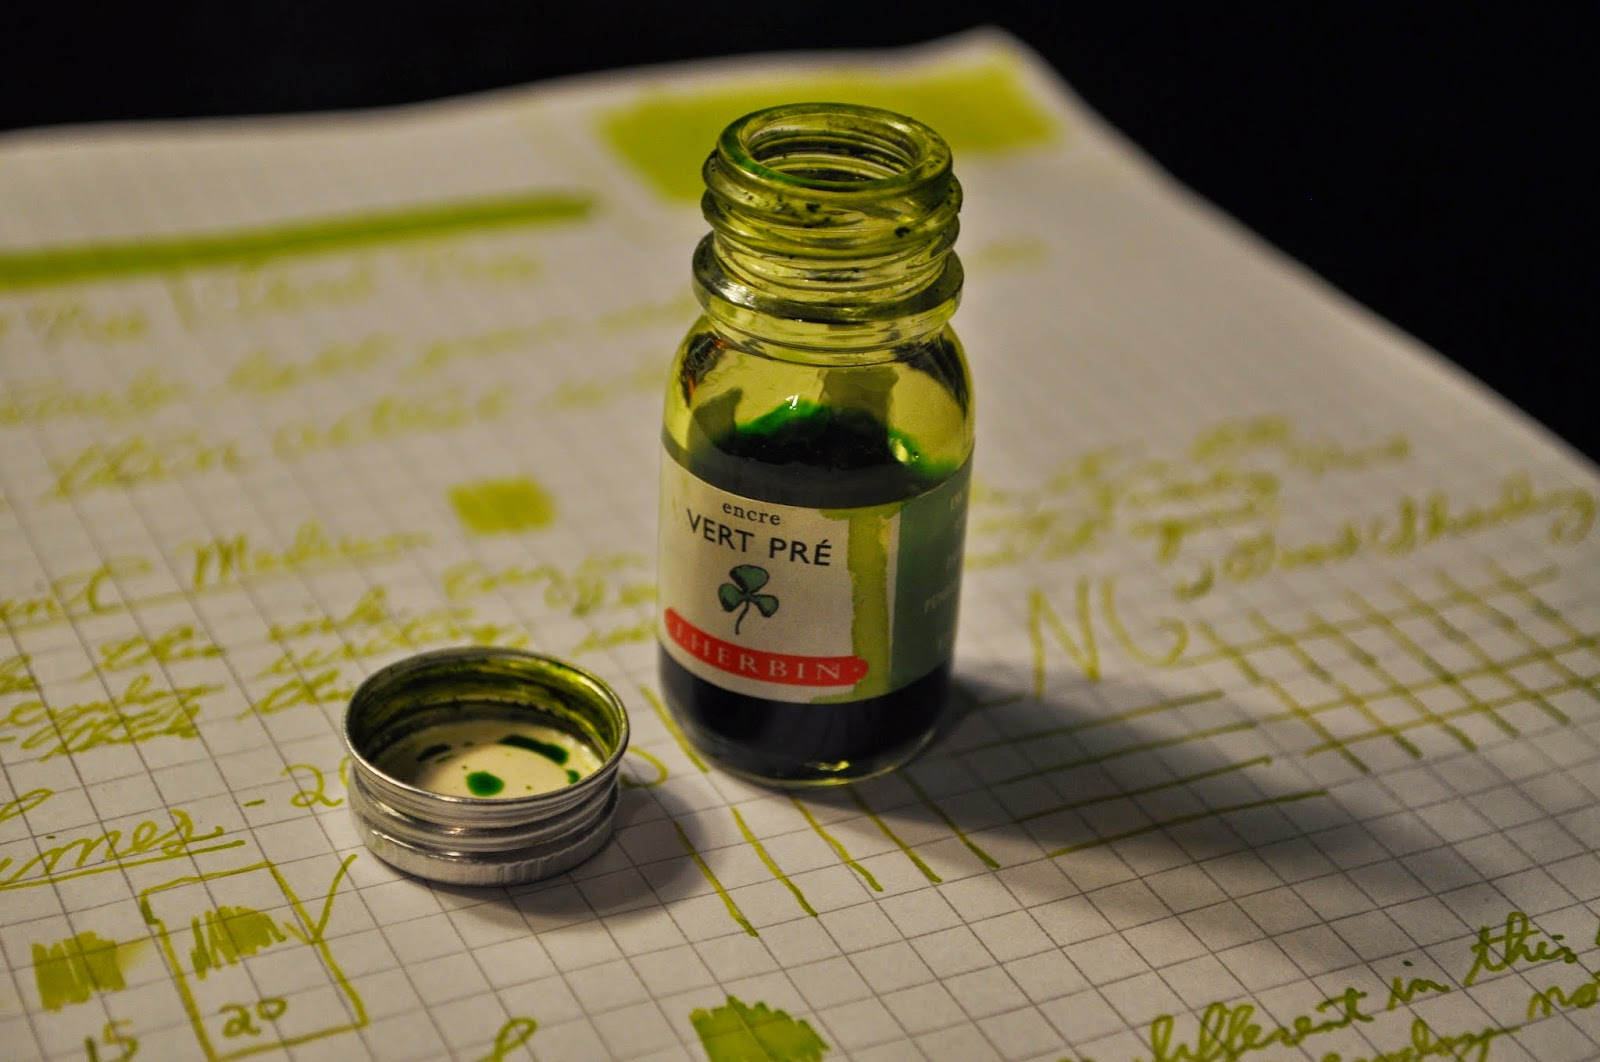 J. Herbin Vert Pre Review